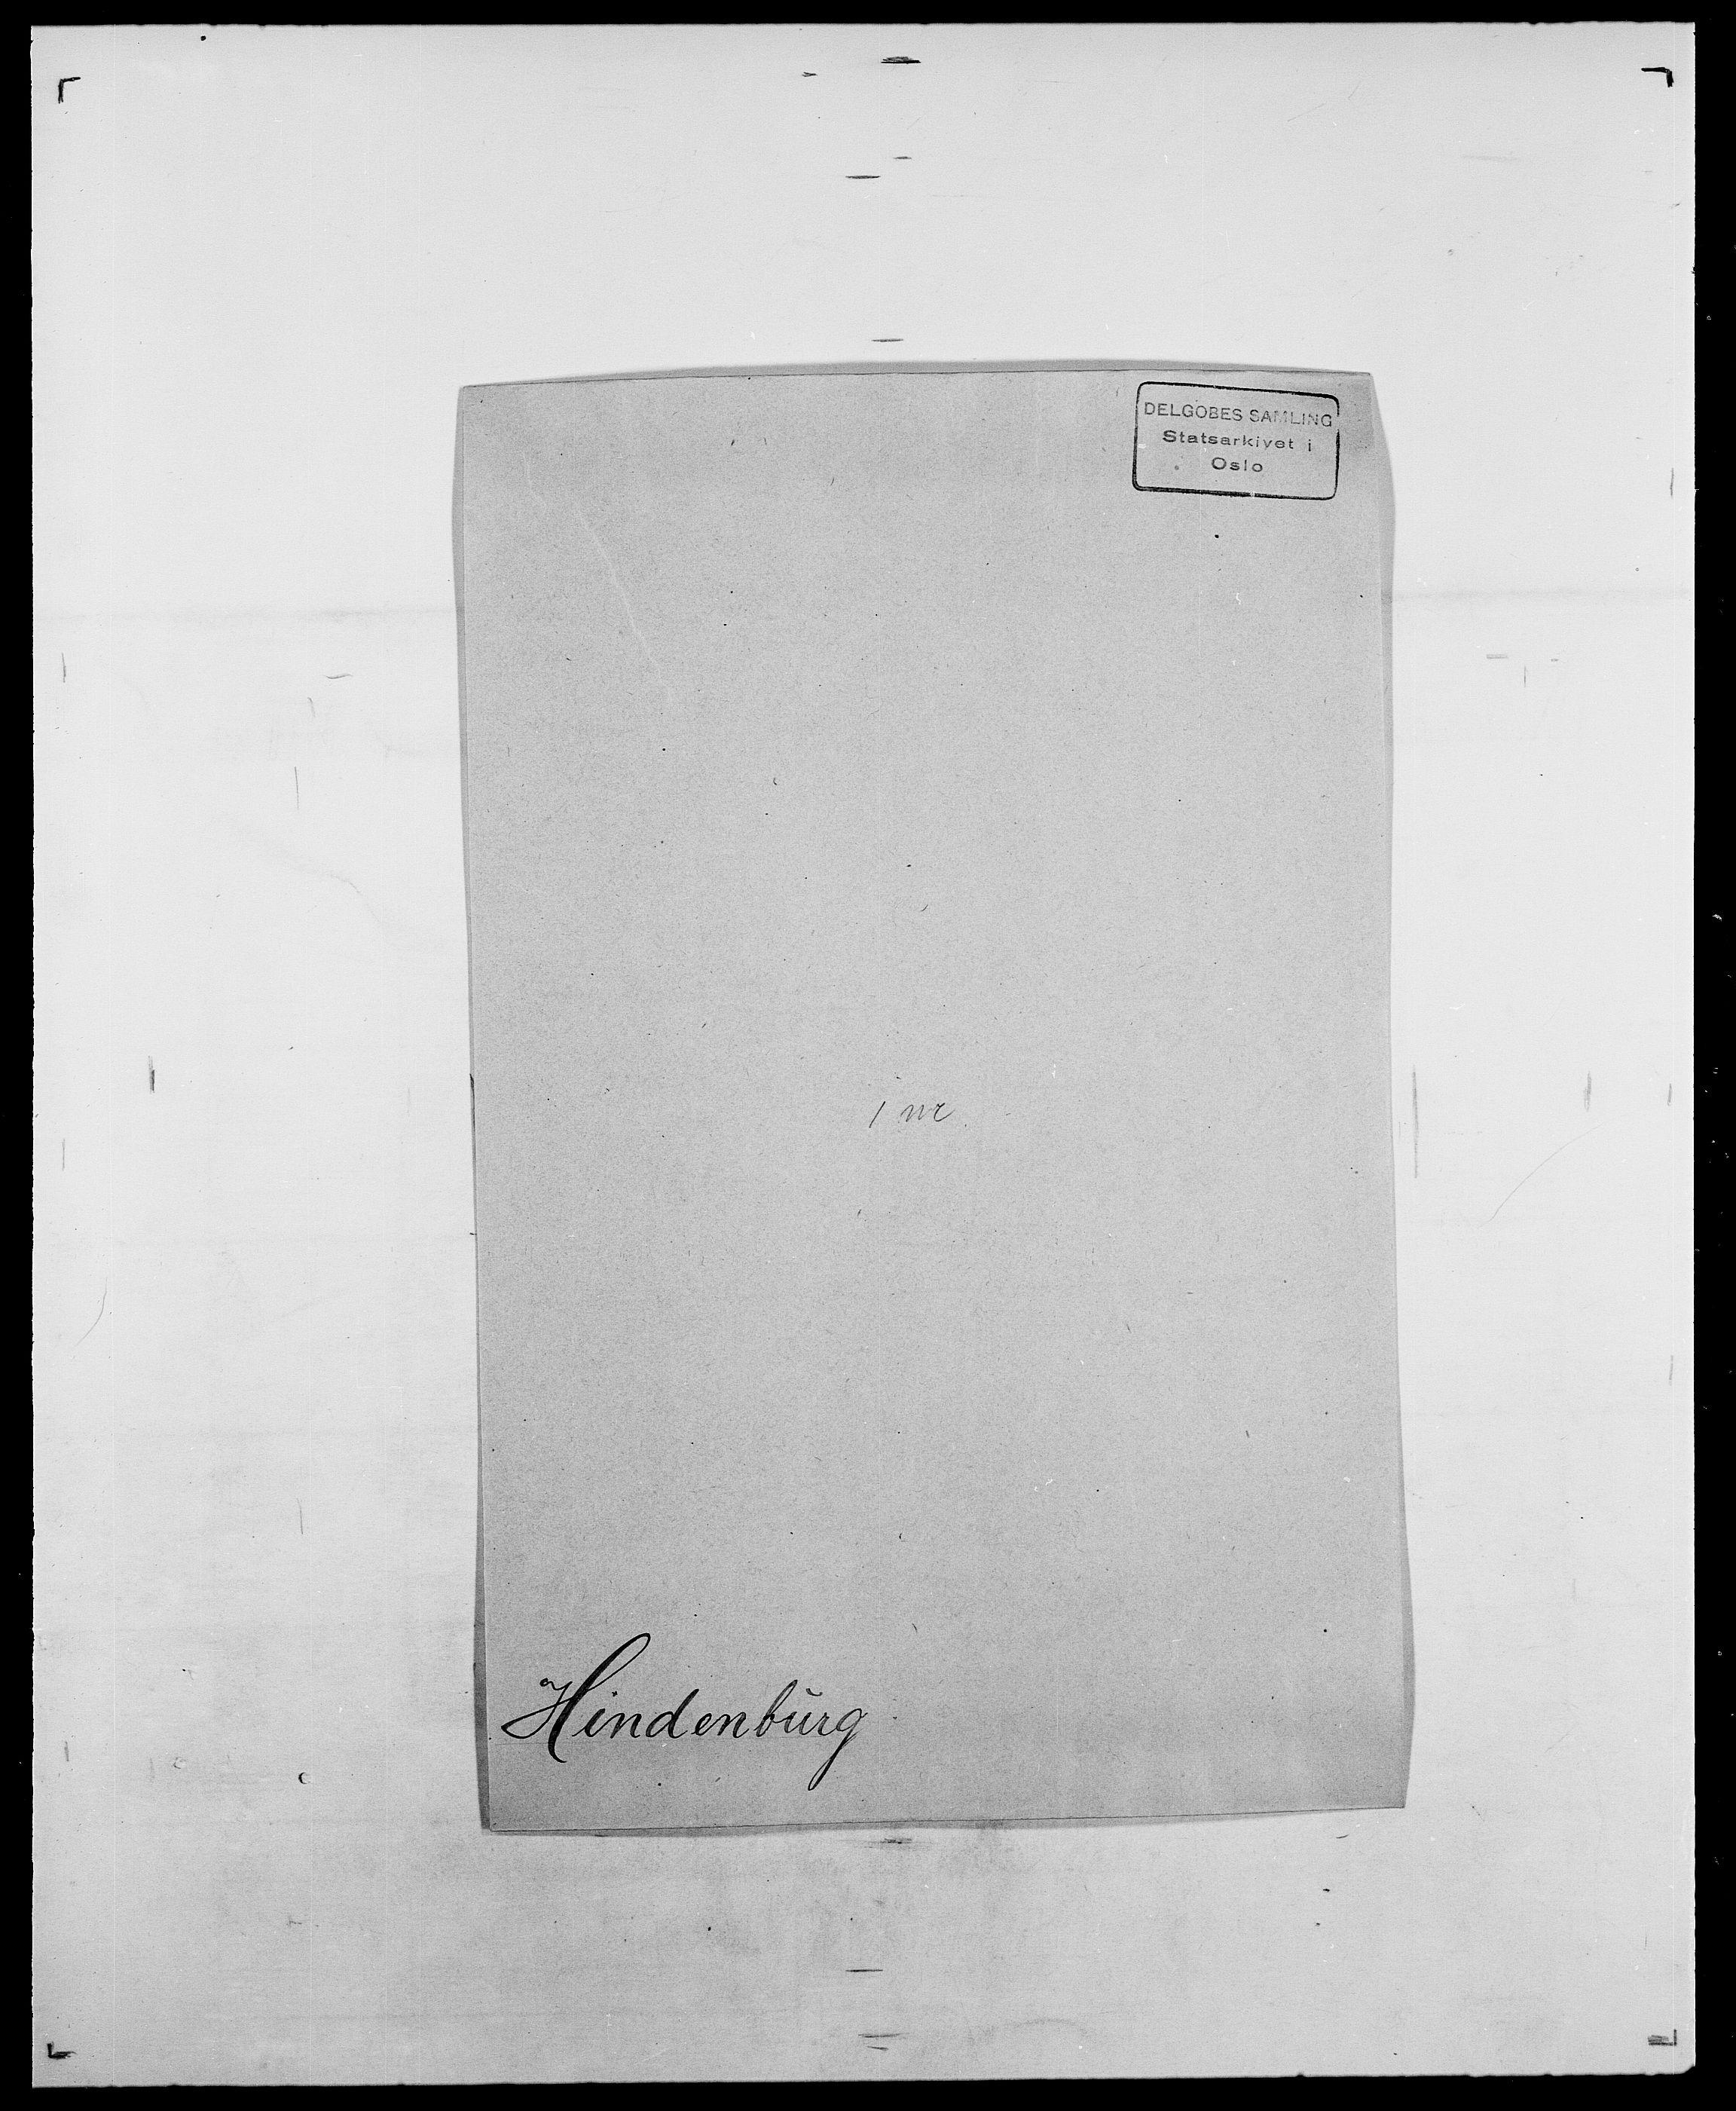 SAO, Delgobe, Charles Antoine - samling, D/Da/L0017: Helander - Hjørne, s. 462